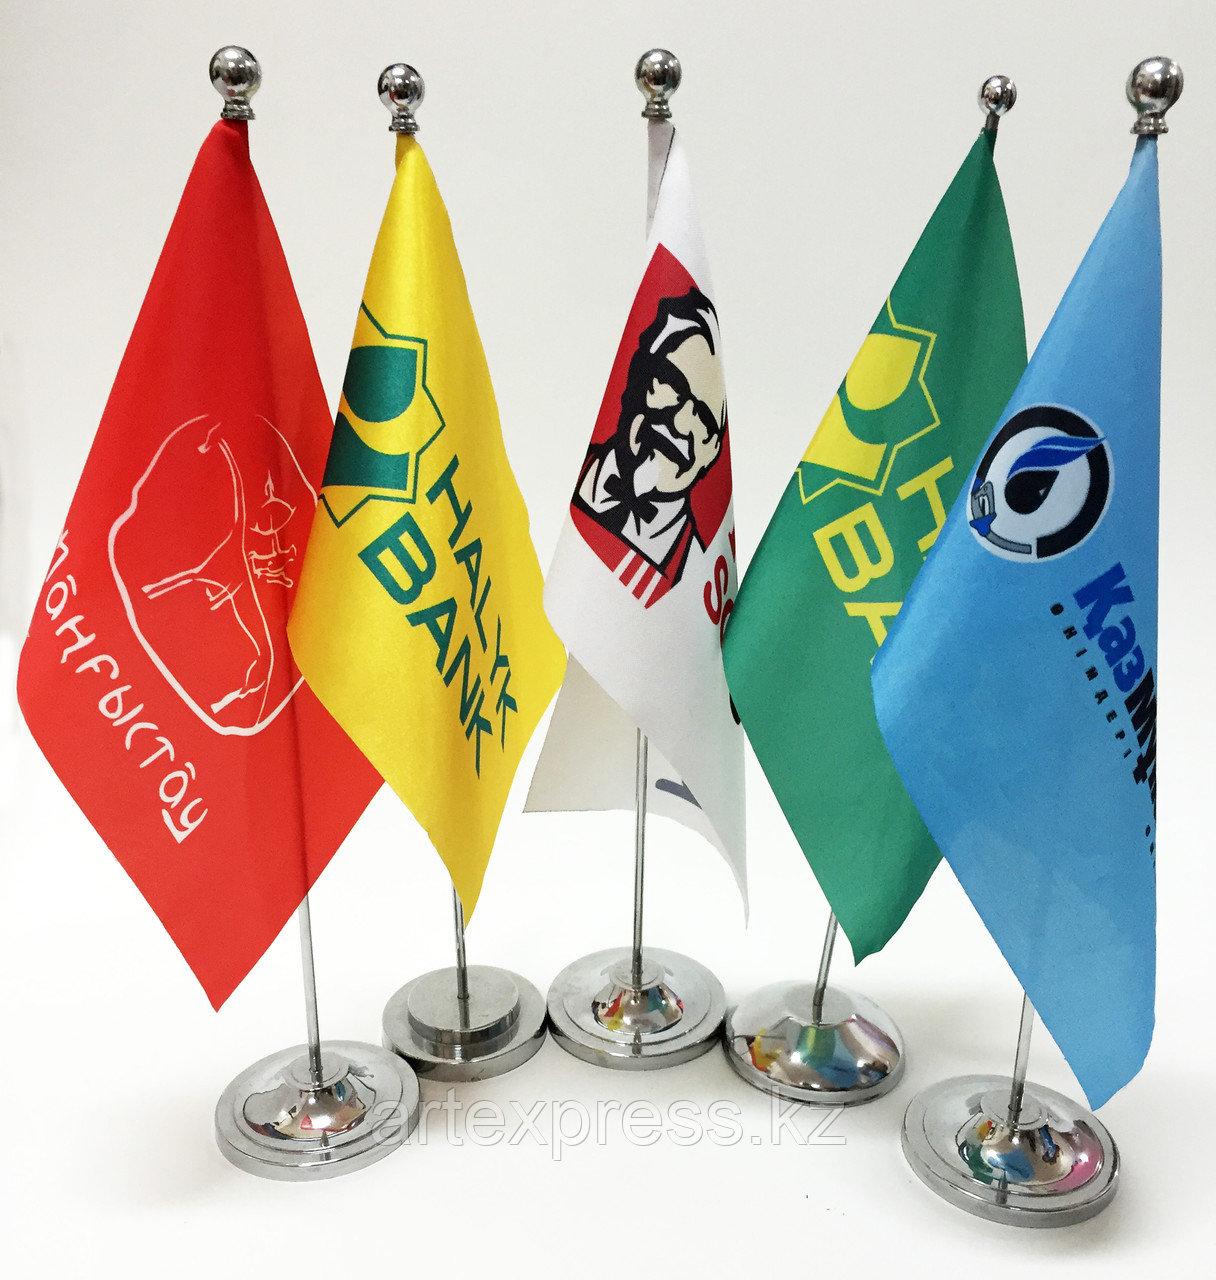 Флаг настольный, флажок